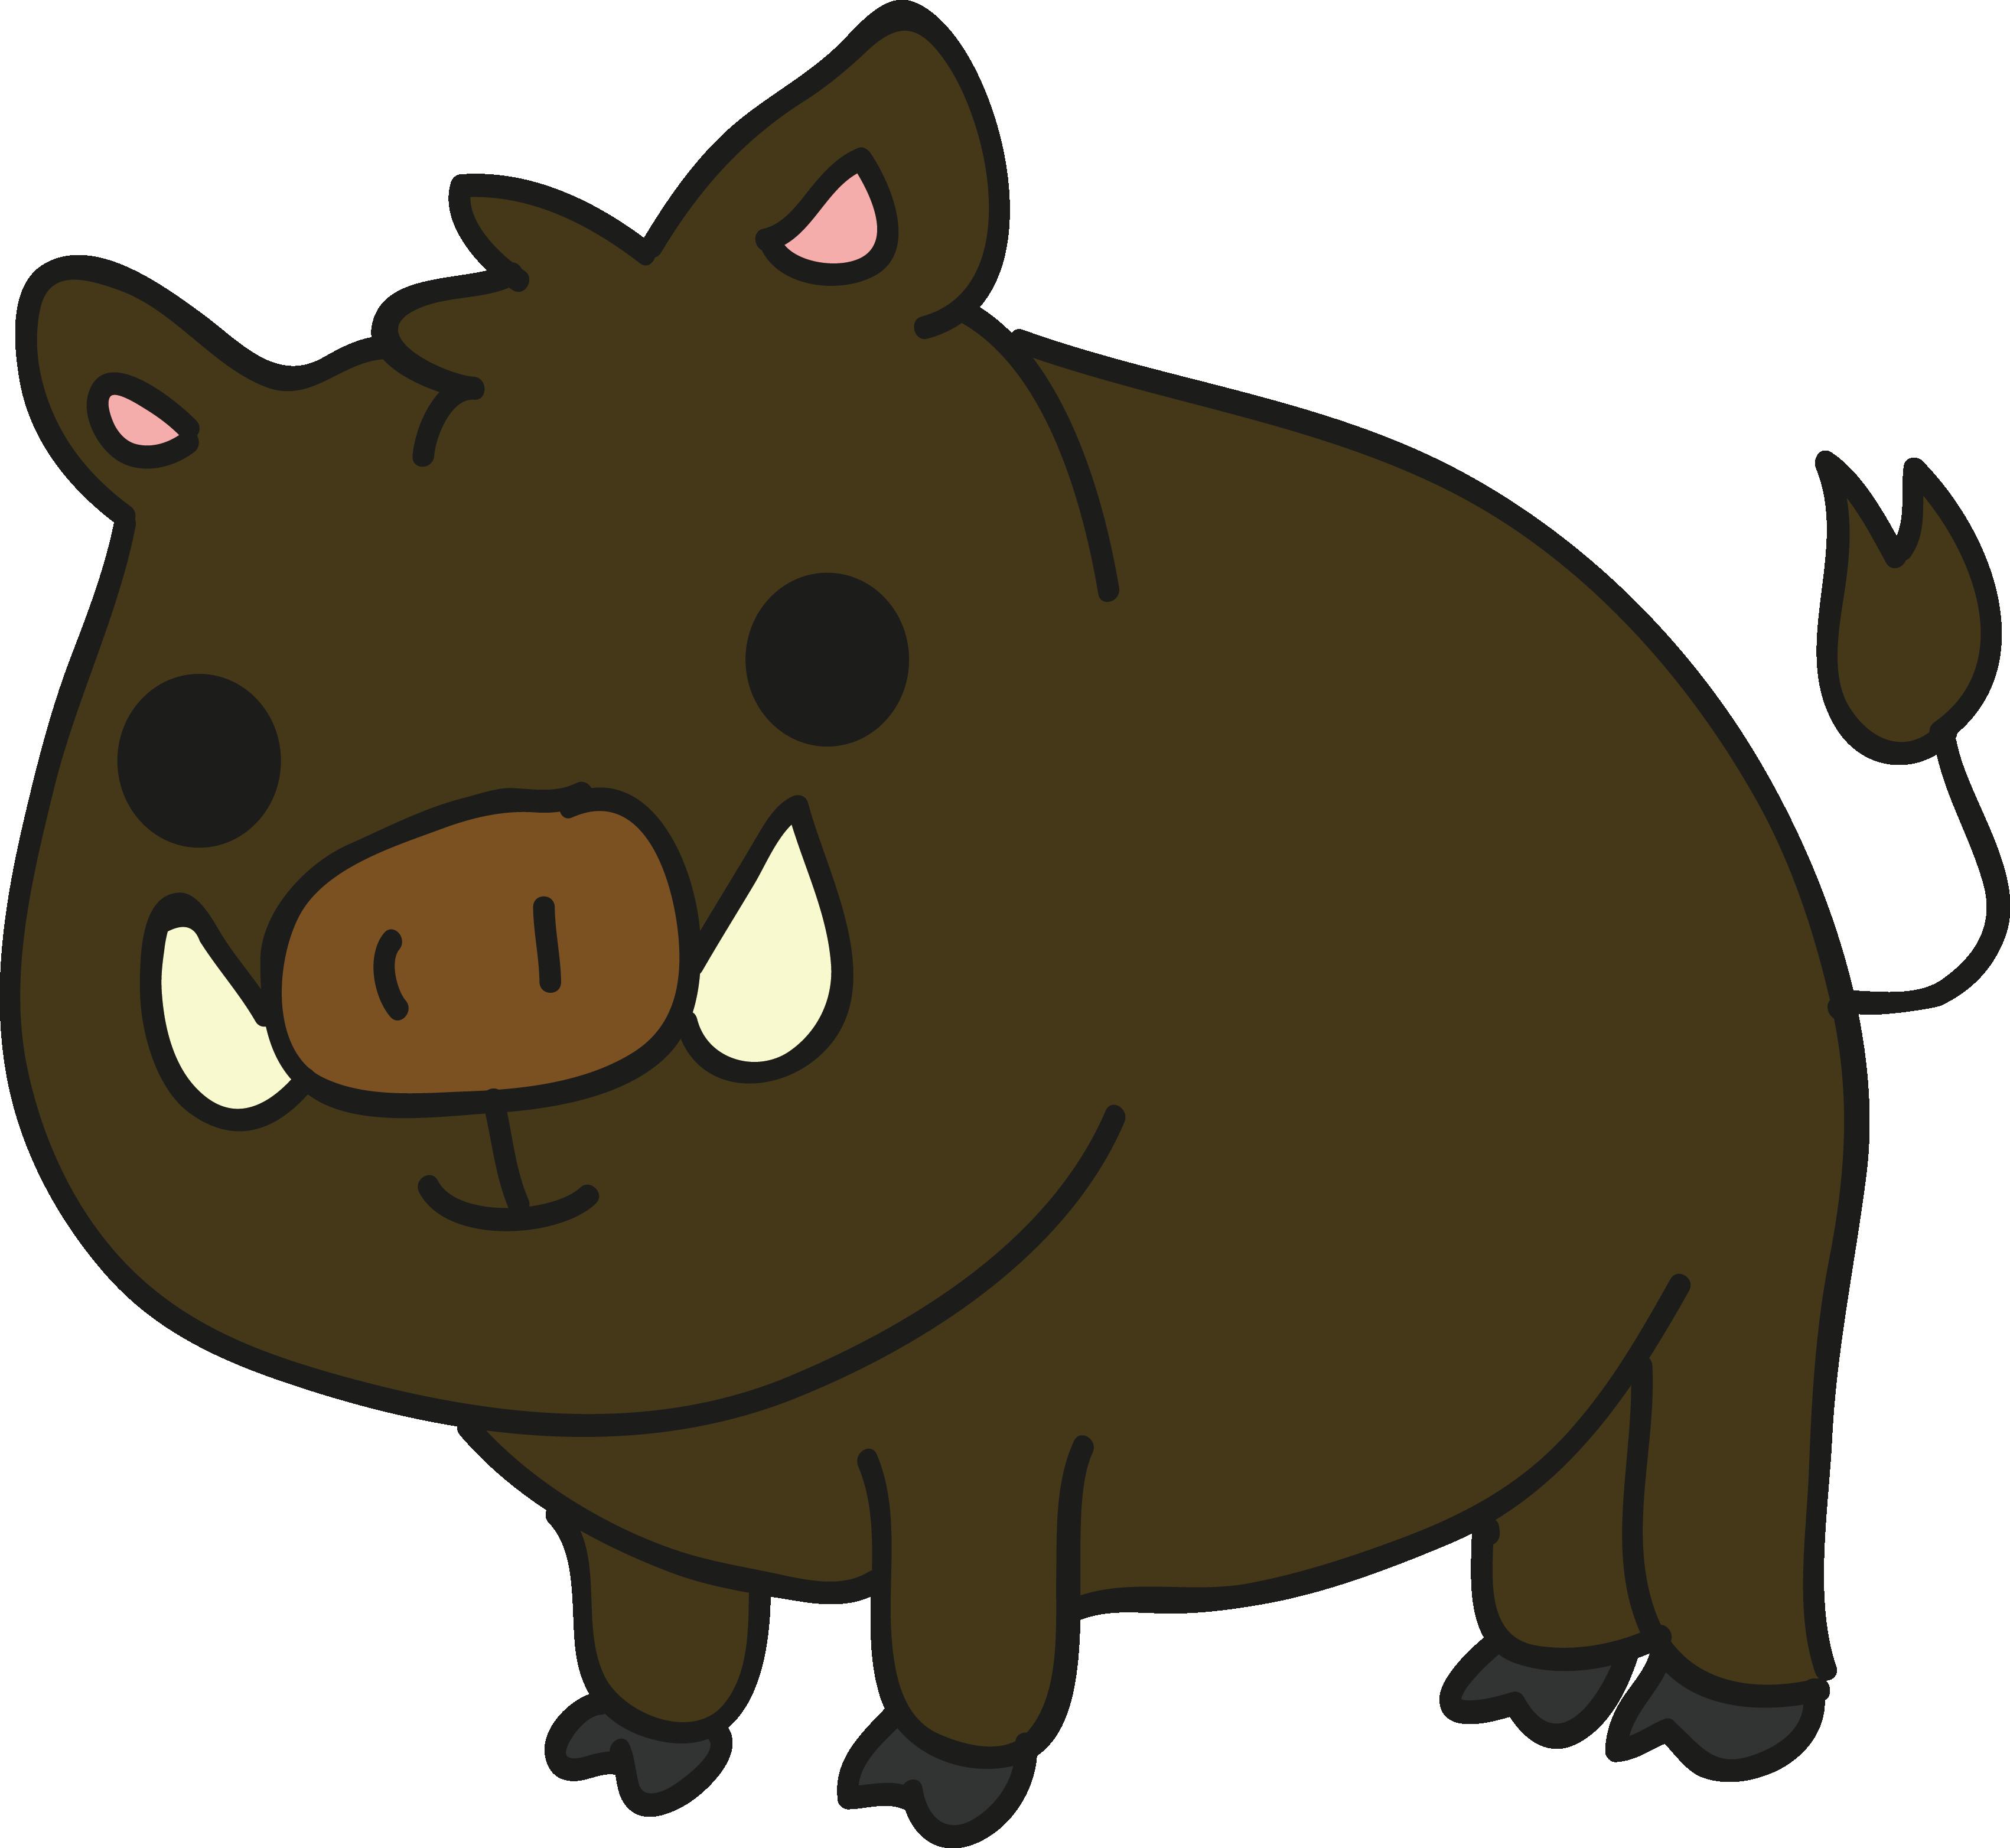 Boar cartoon clip art. Clipart hippo wild animal